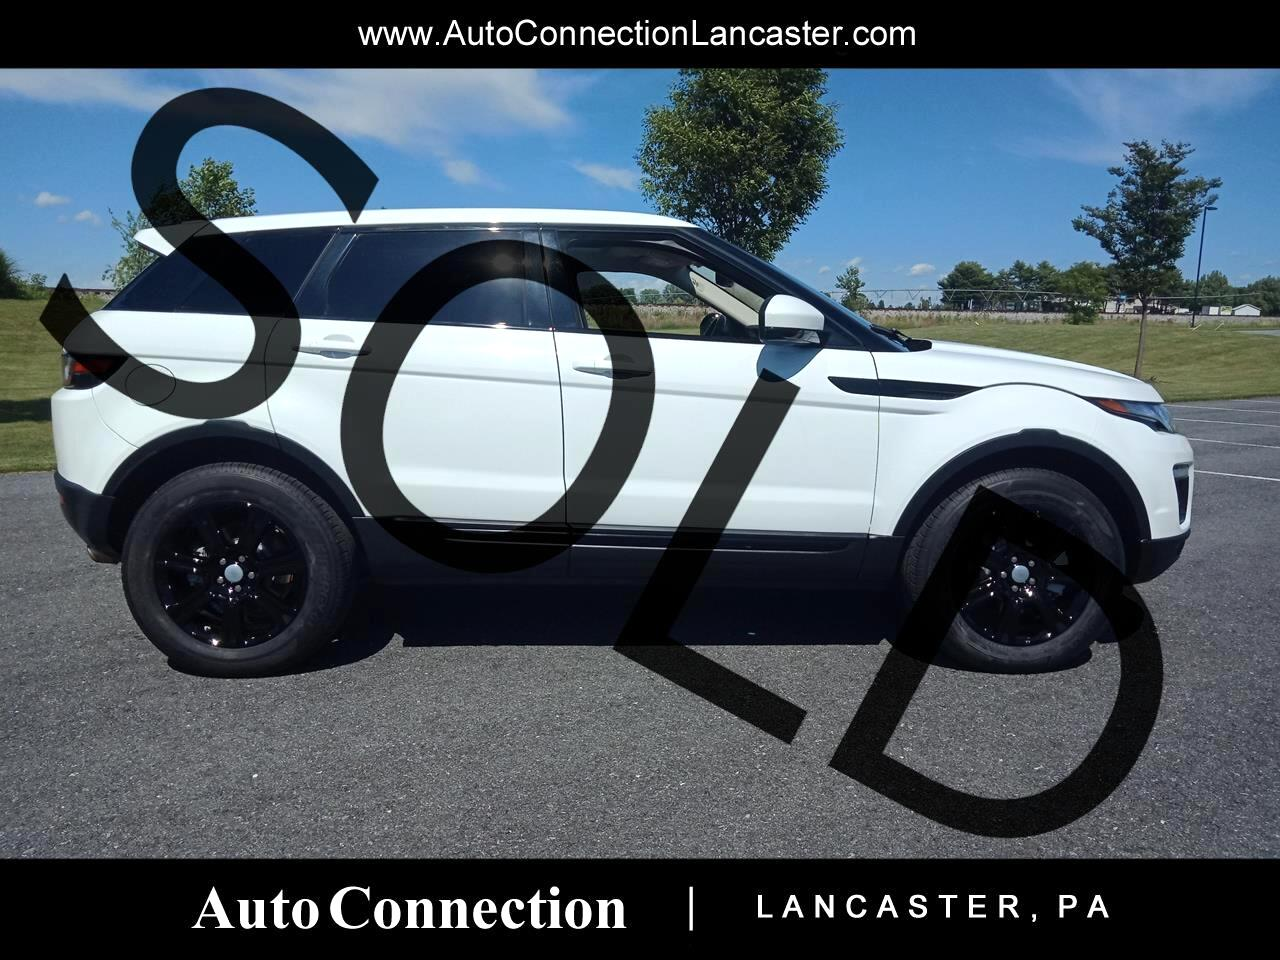 2016 Land Rover Range Rover Evoque 5dr HB SE